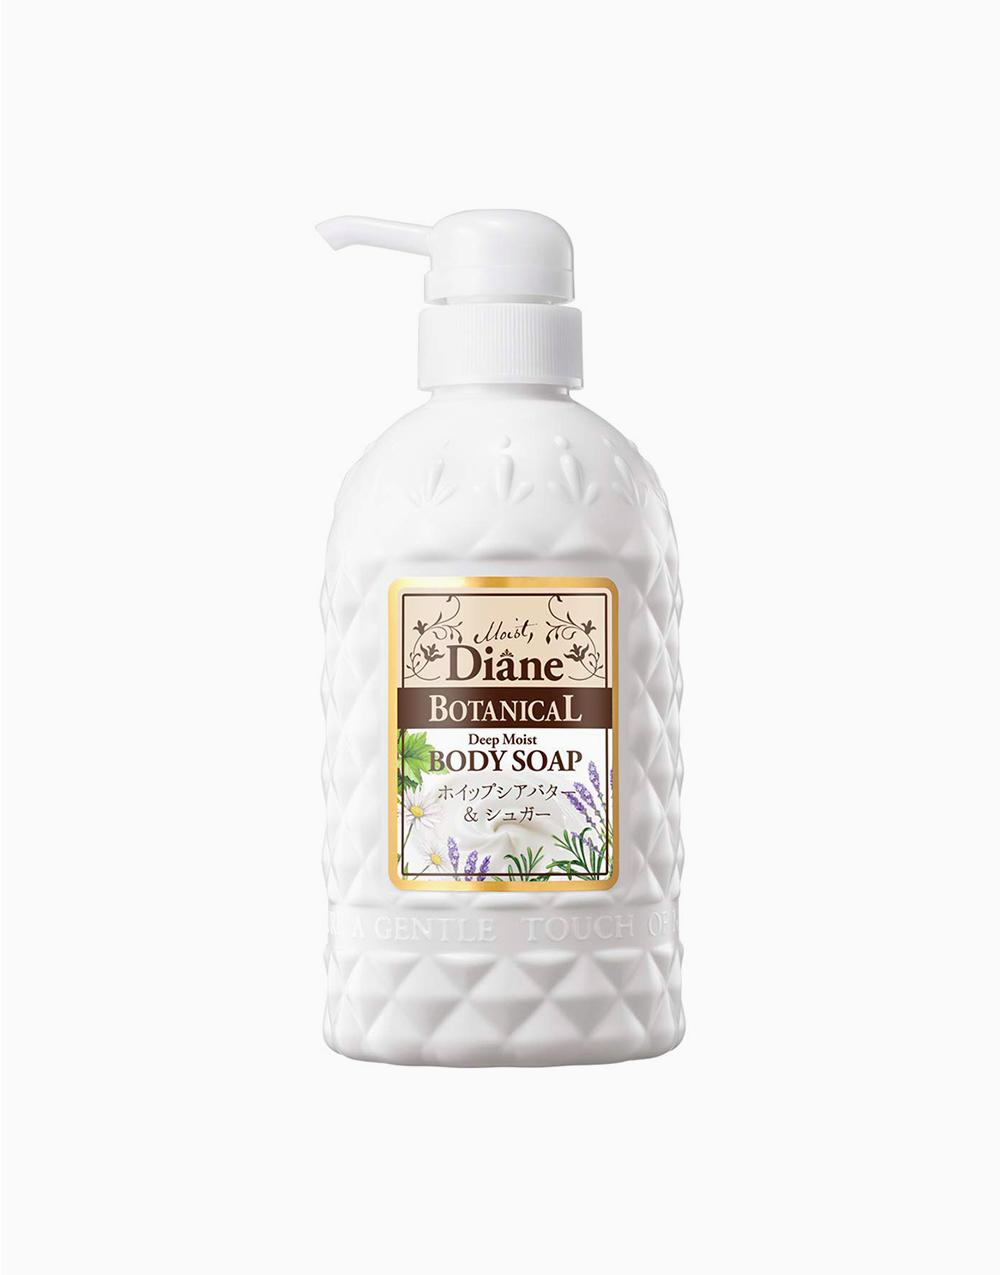 Deep Moist Botanical Body Soap by Moist Diane